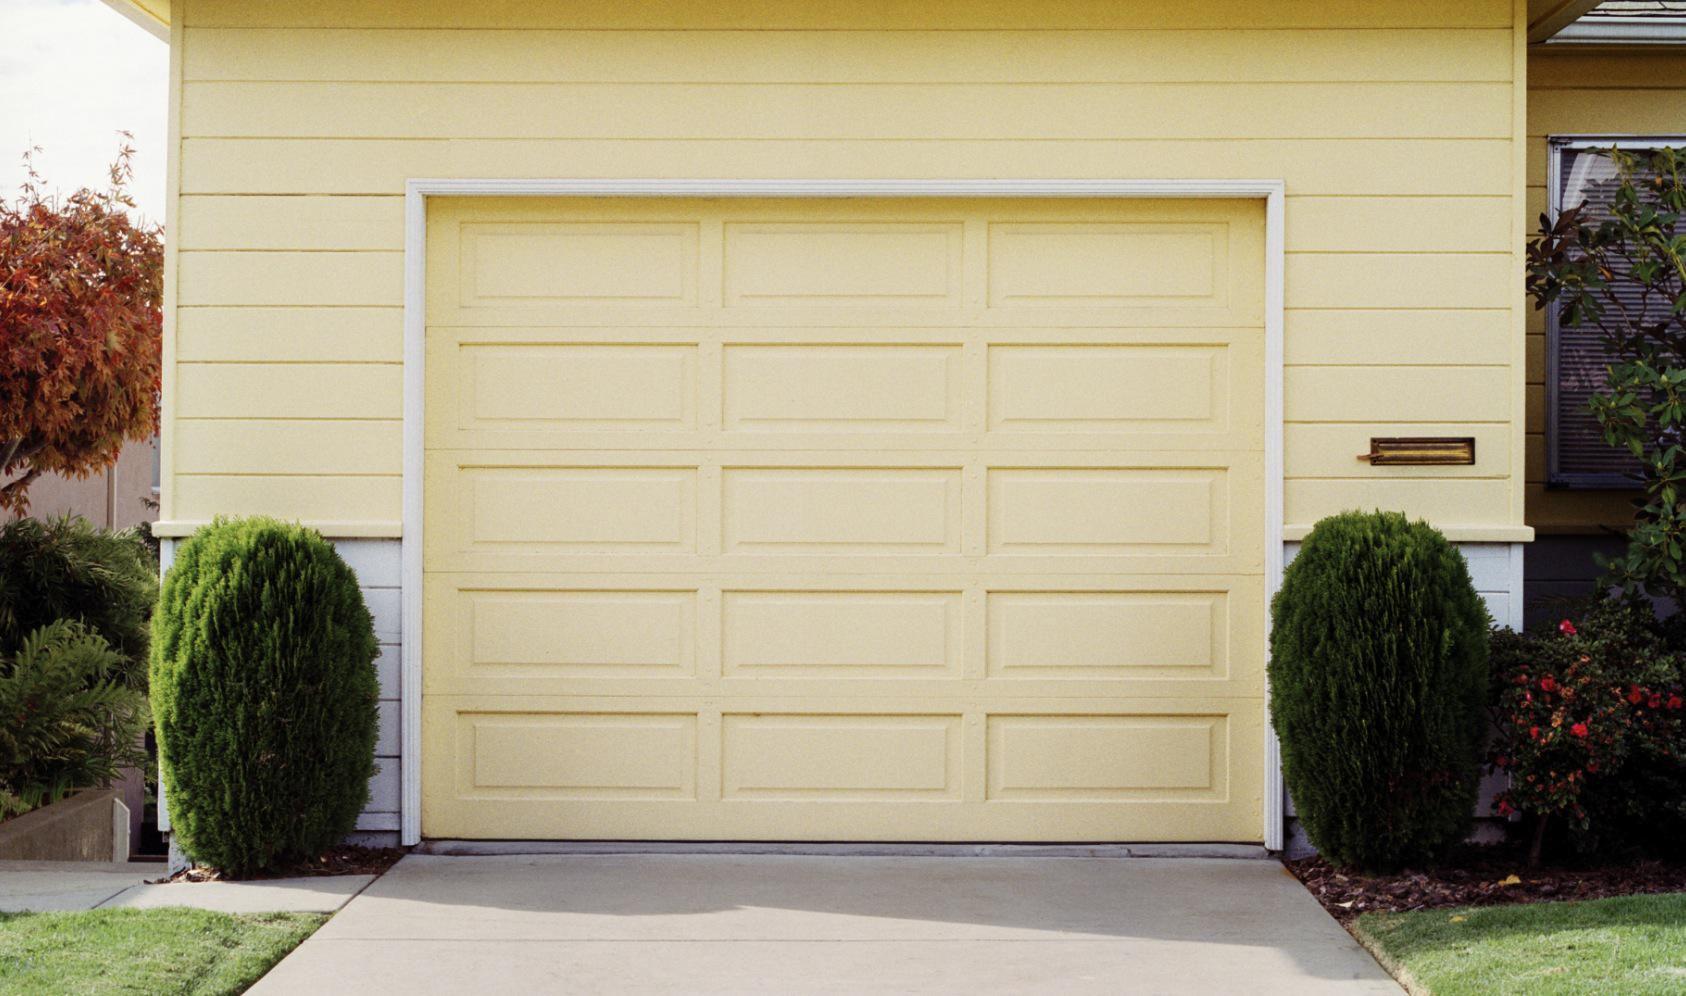 Garage door repair maintenance and quick fixes rubansaba